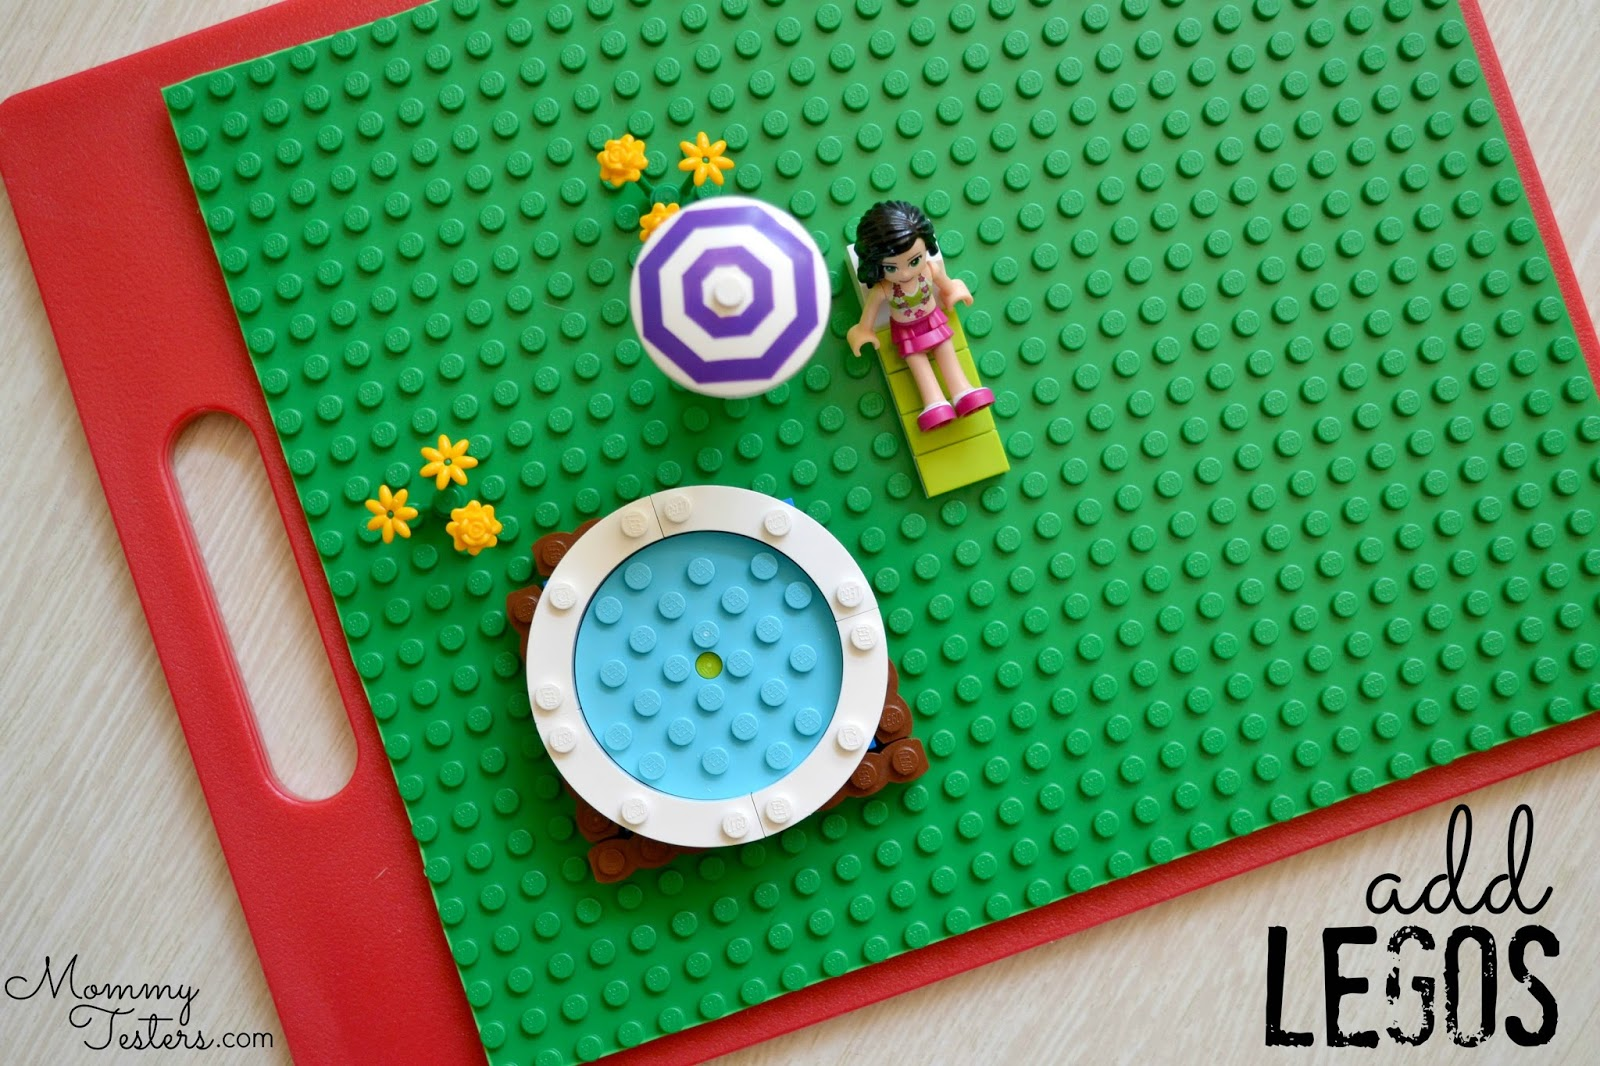 Mommy testers diy travel busy board for kids a diy lego for Lego diy